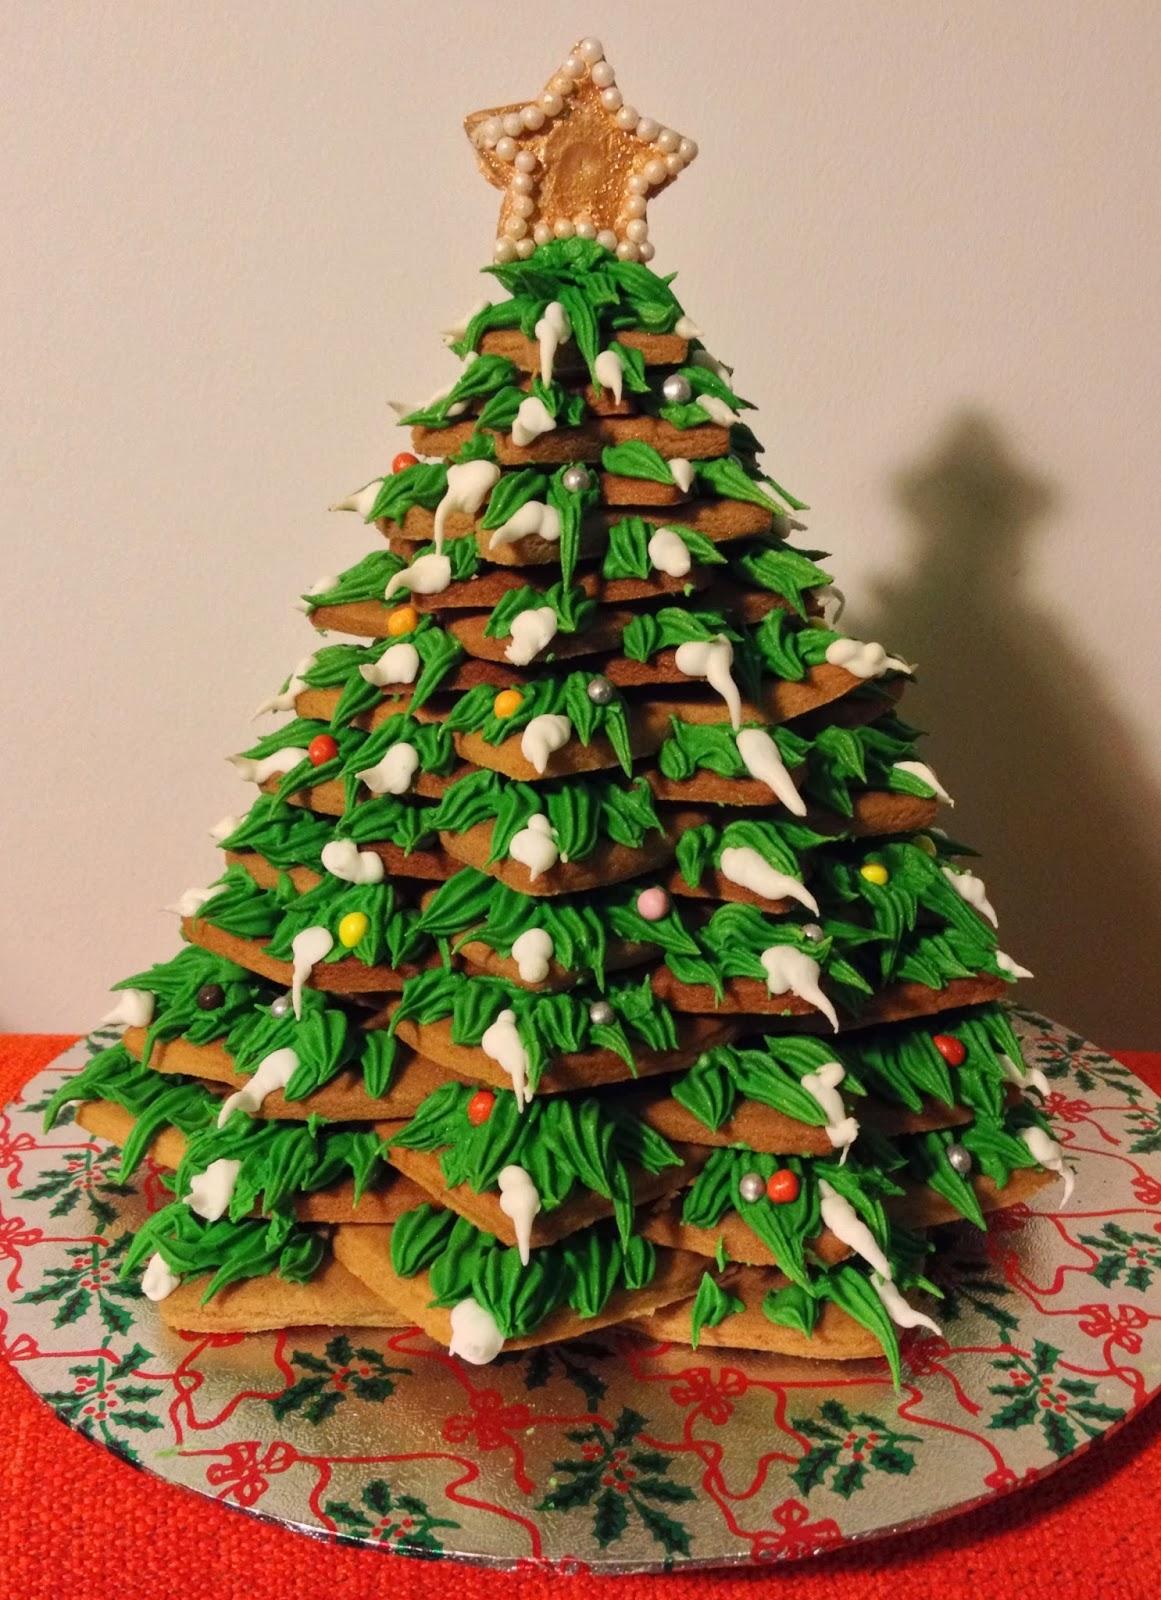 How to make a 3d christmas tree cake